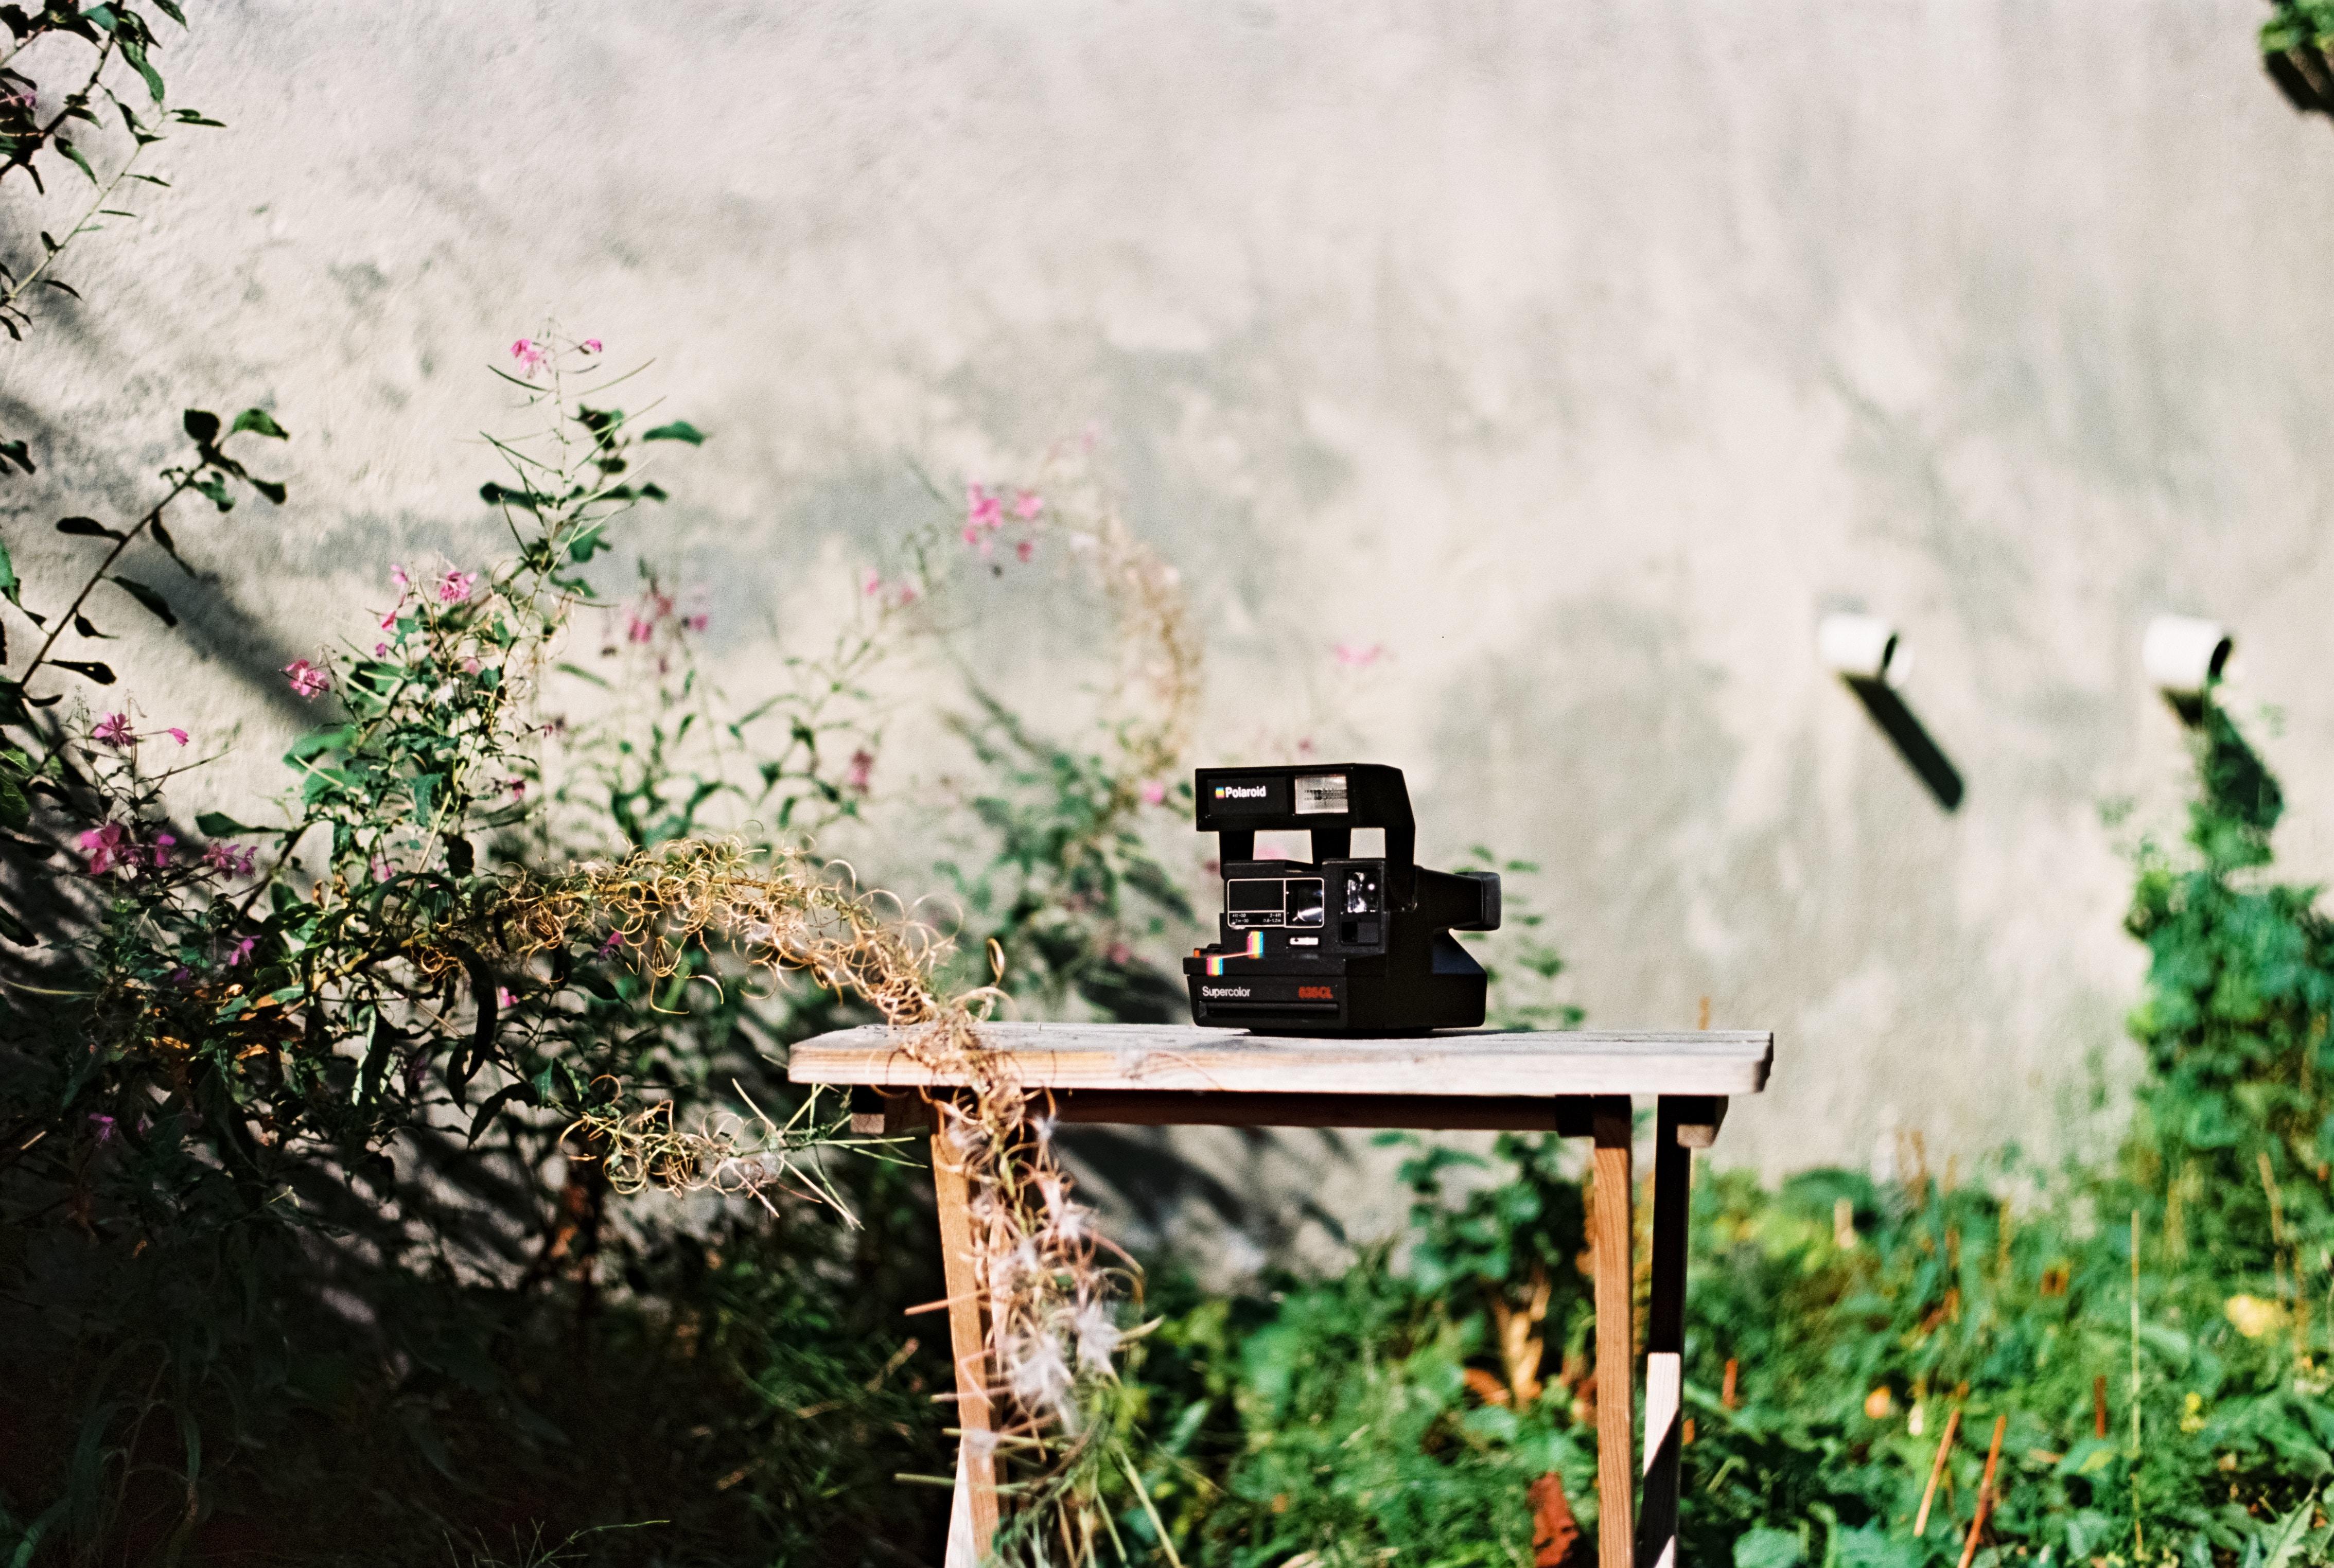 black land camera on brown wooden bench